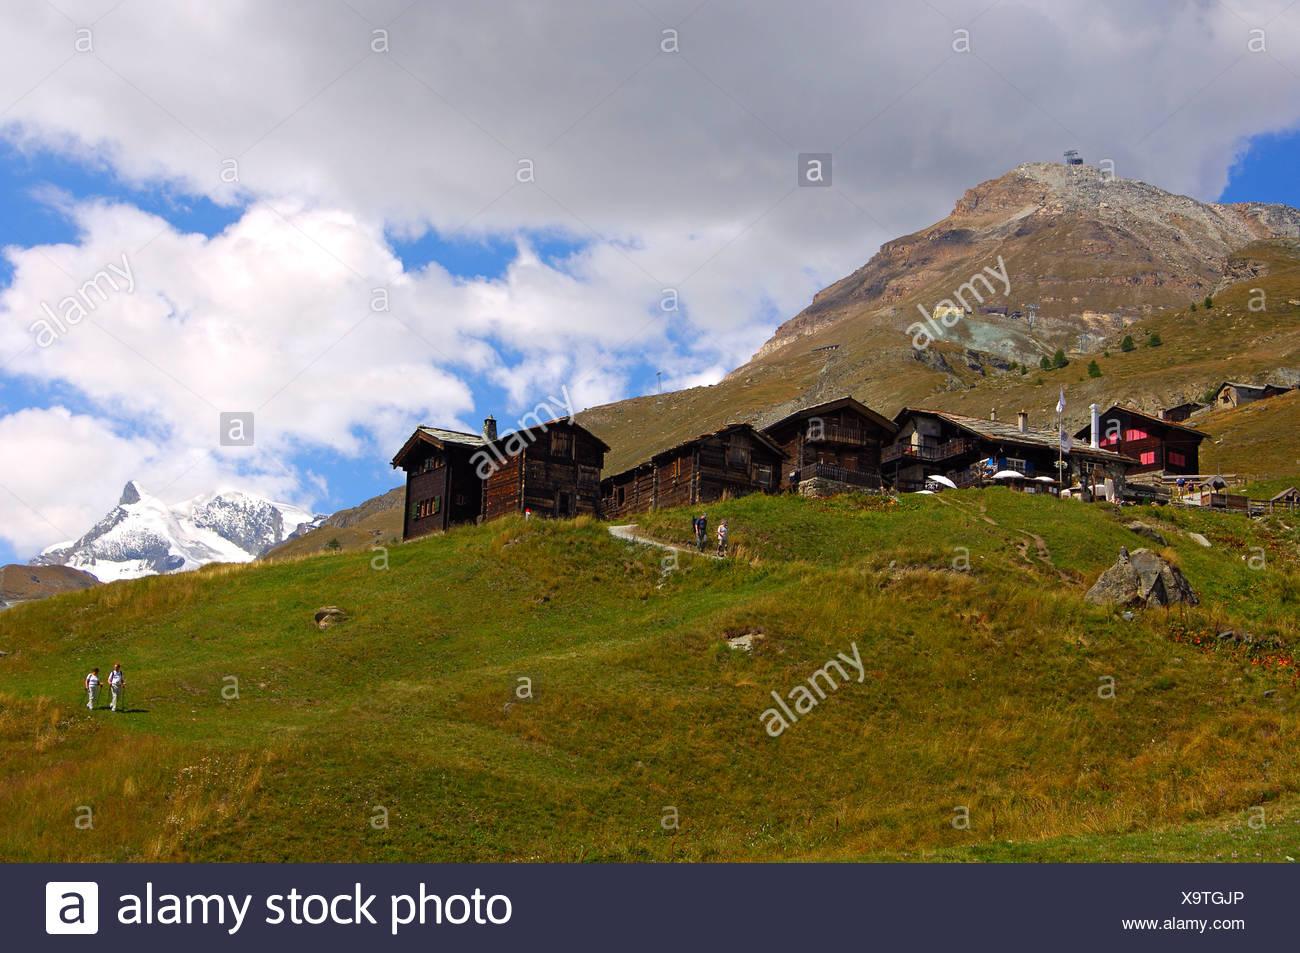 Hamlet Findeln near Zermatt, peak Adlerhorn, Zermatt, Valais, Switzerland - Stock Image